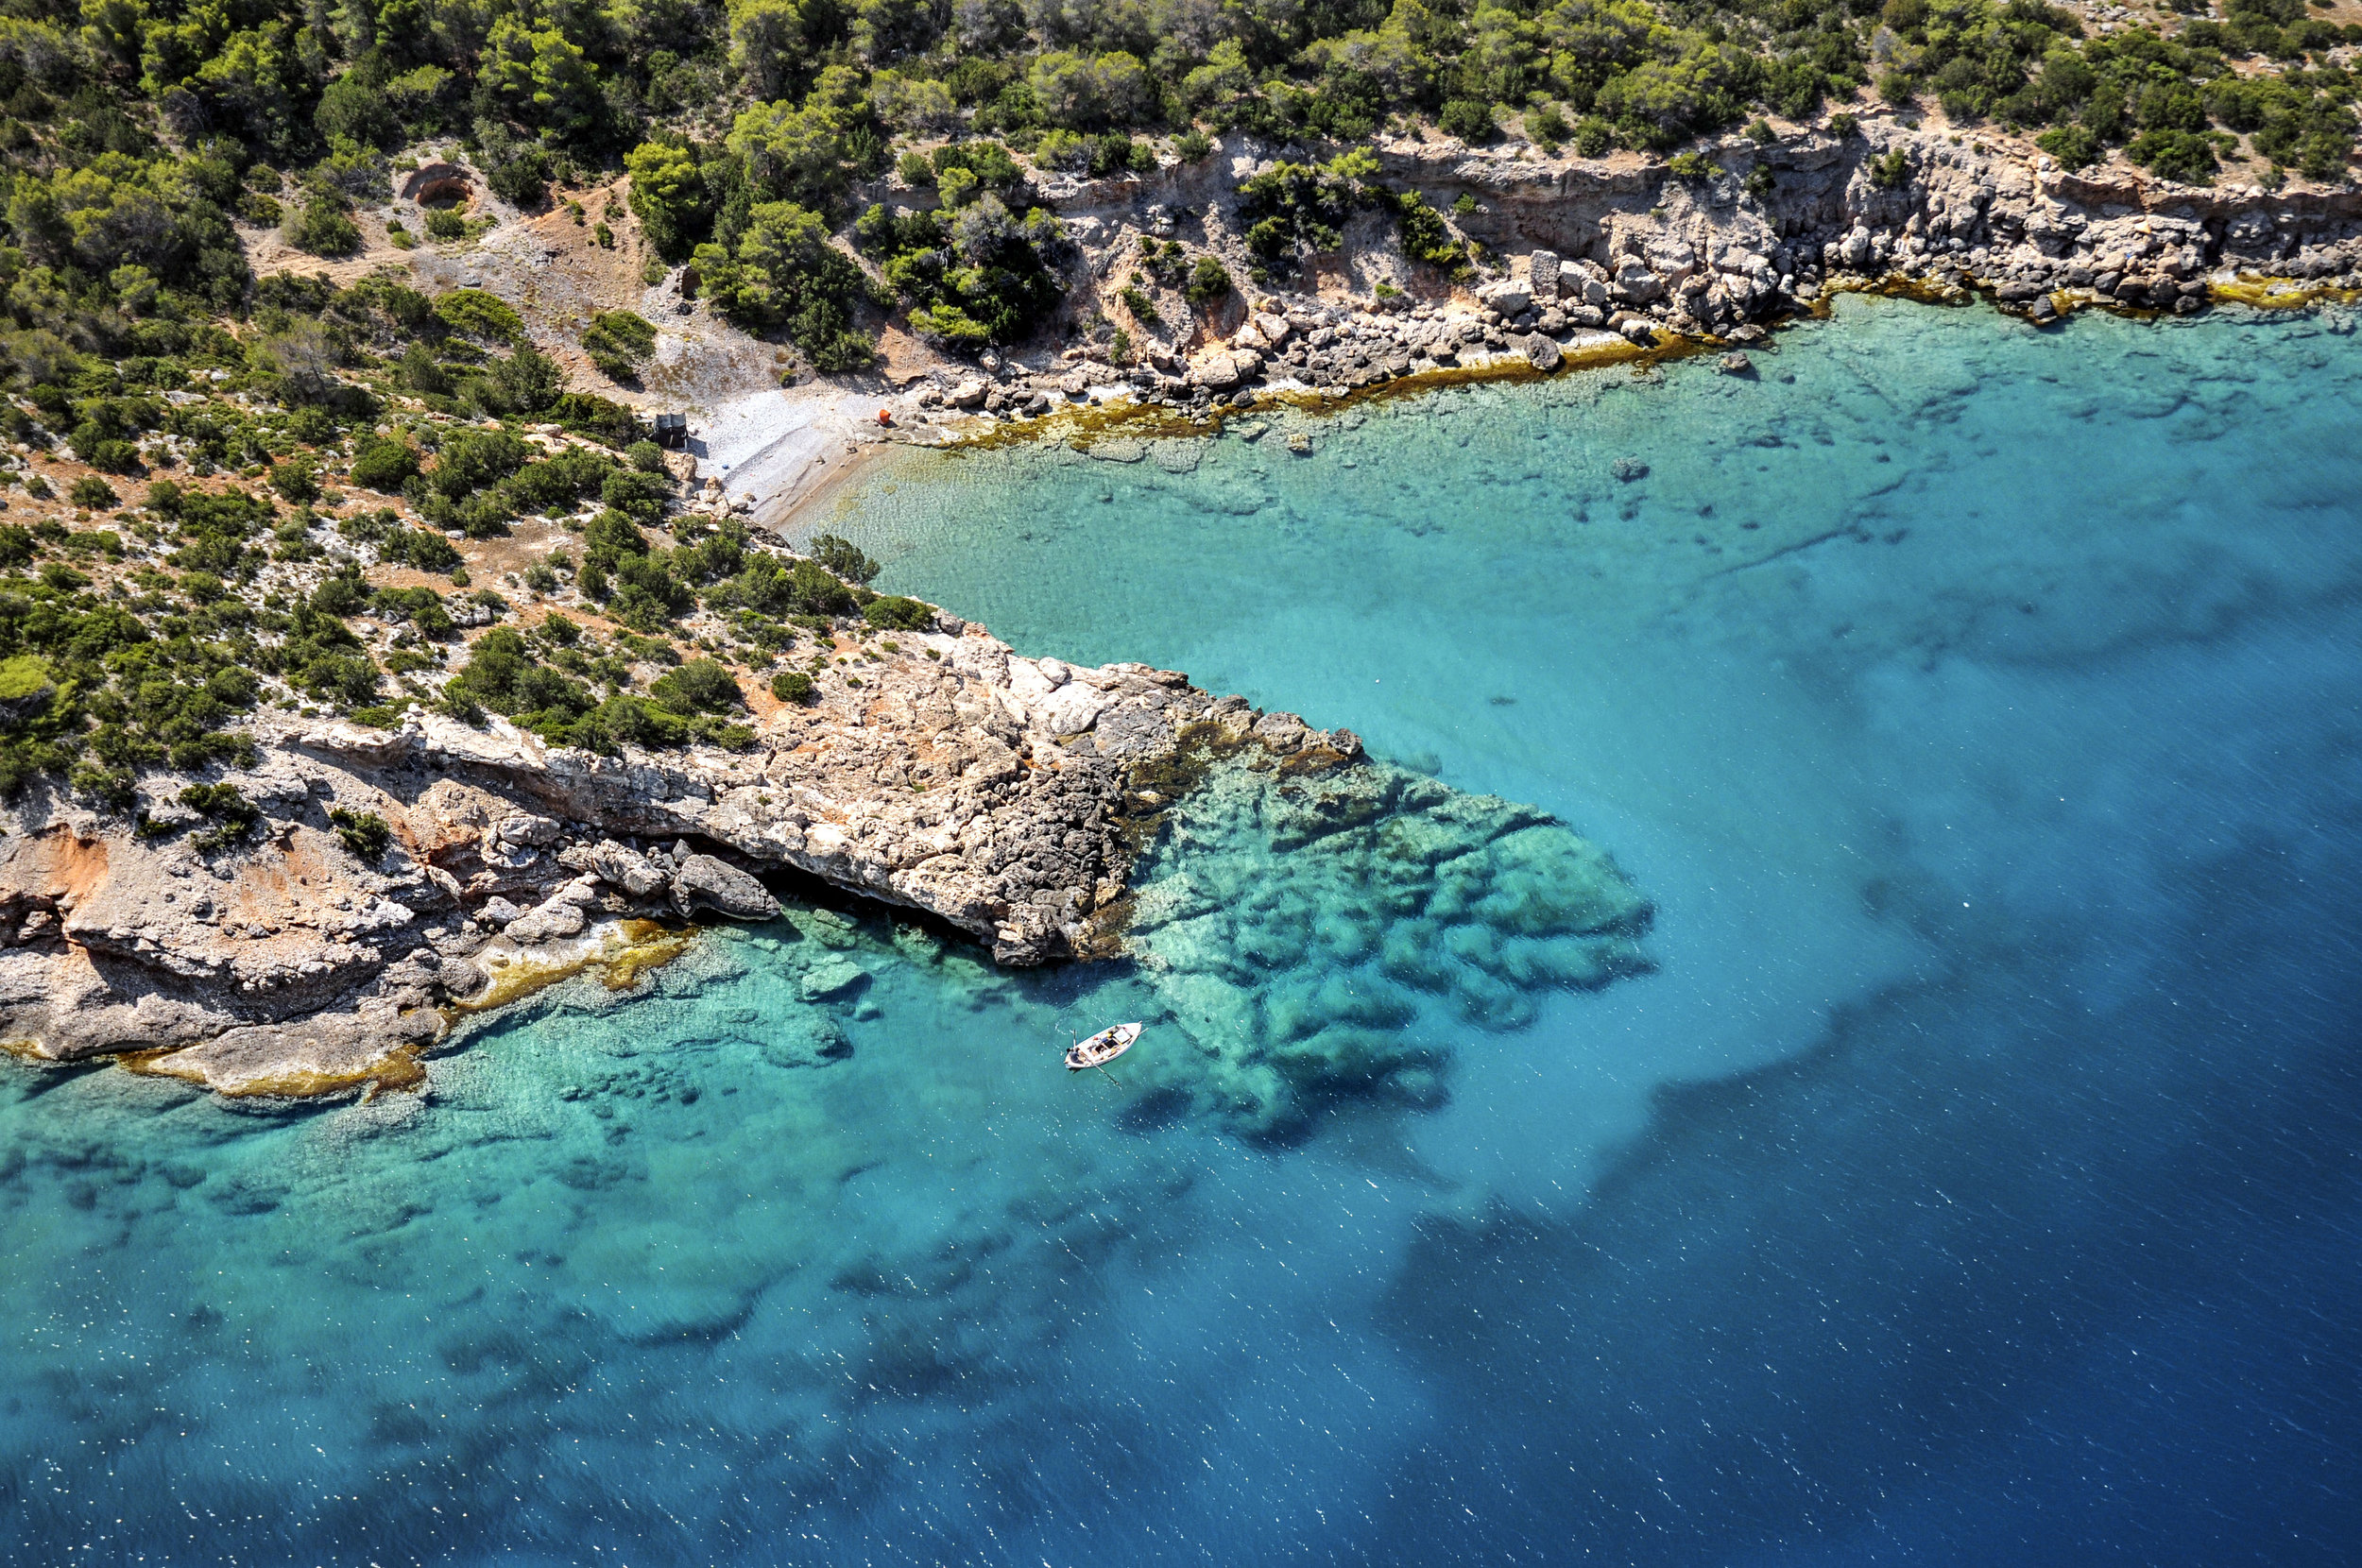 porto Heli, GREECE credit: katerina katopis / coral reef image bank